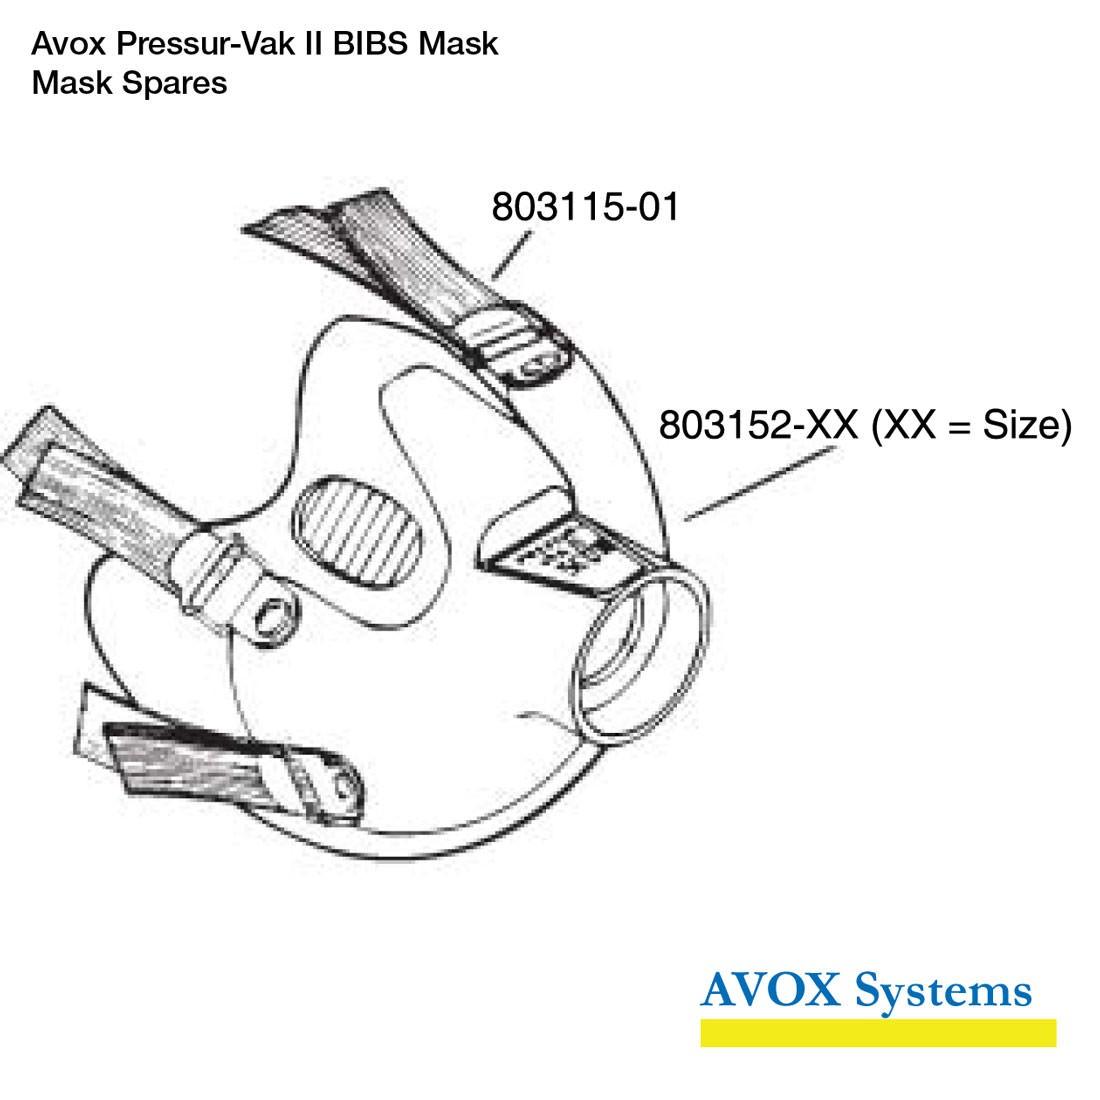 Avox Pressur-Vak II BIBS Mask - Mask Spares